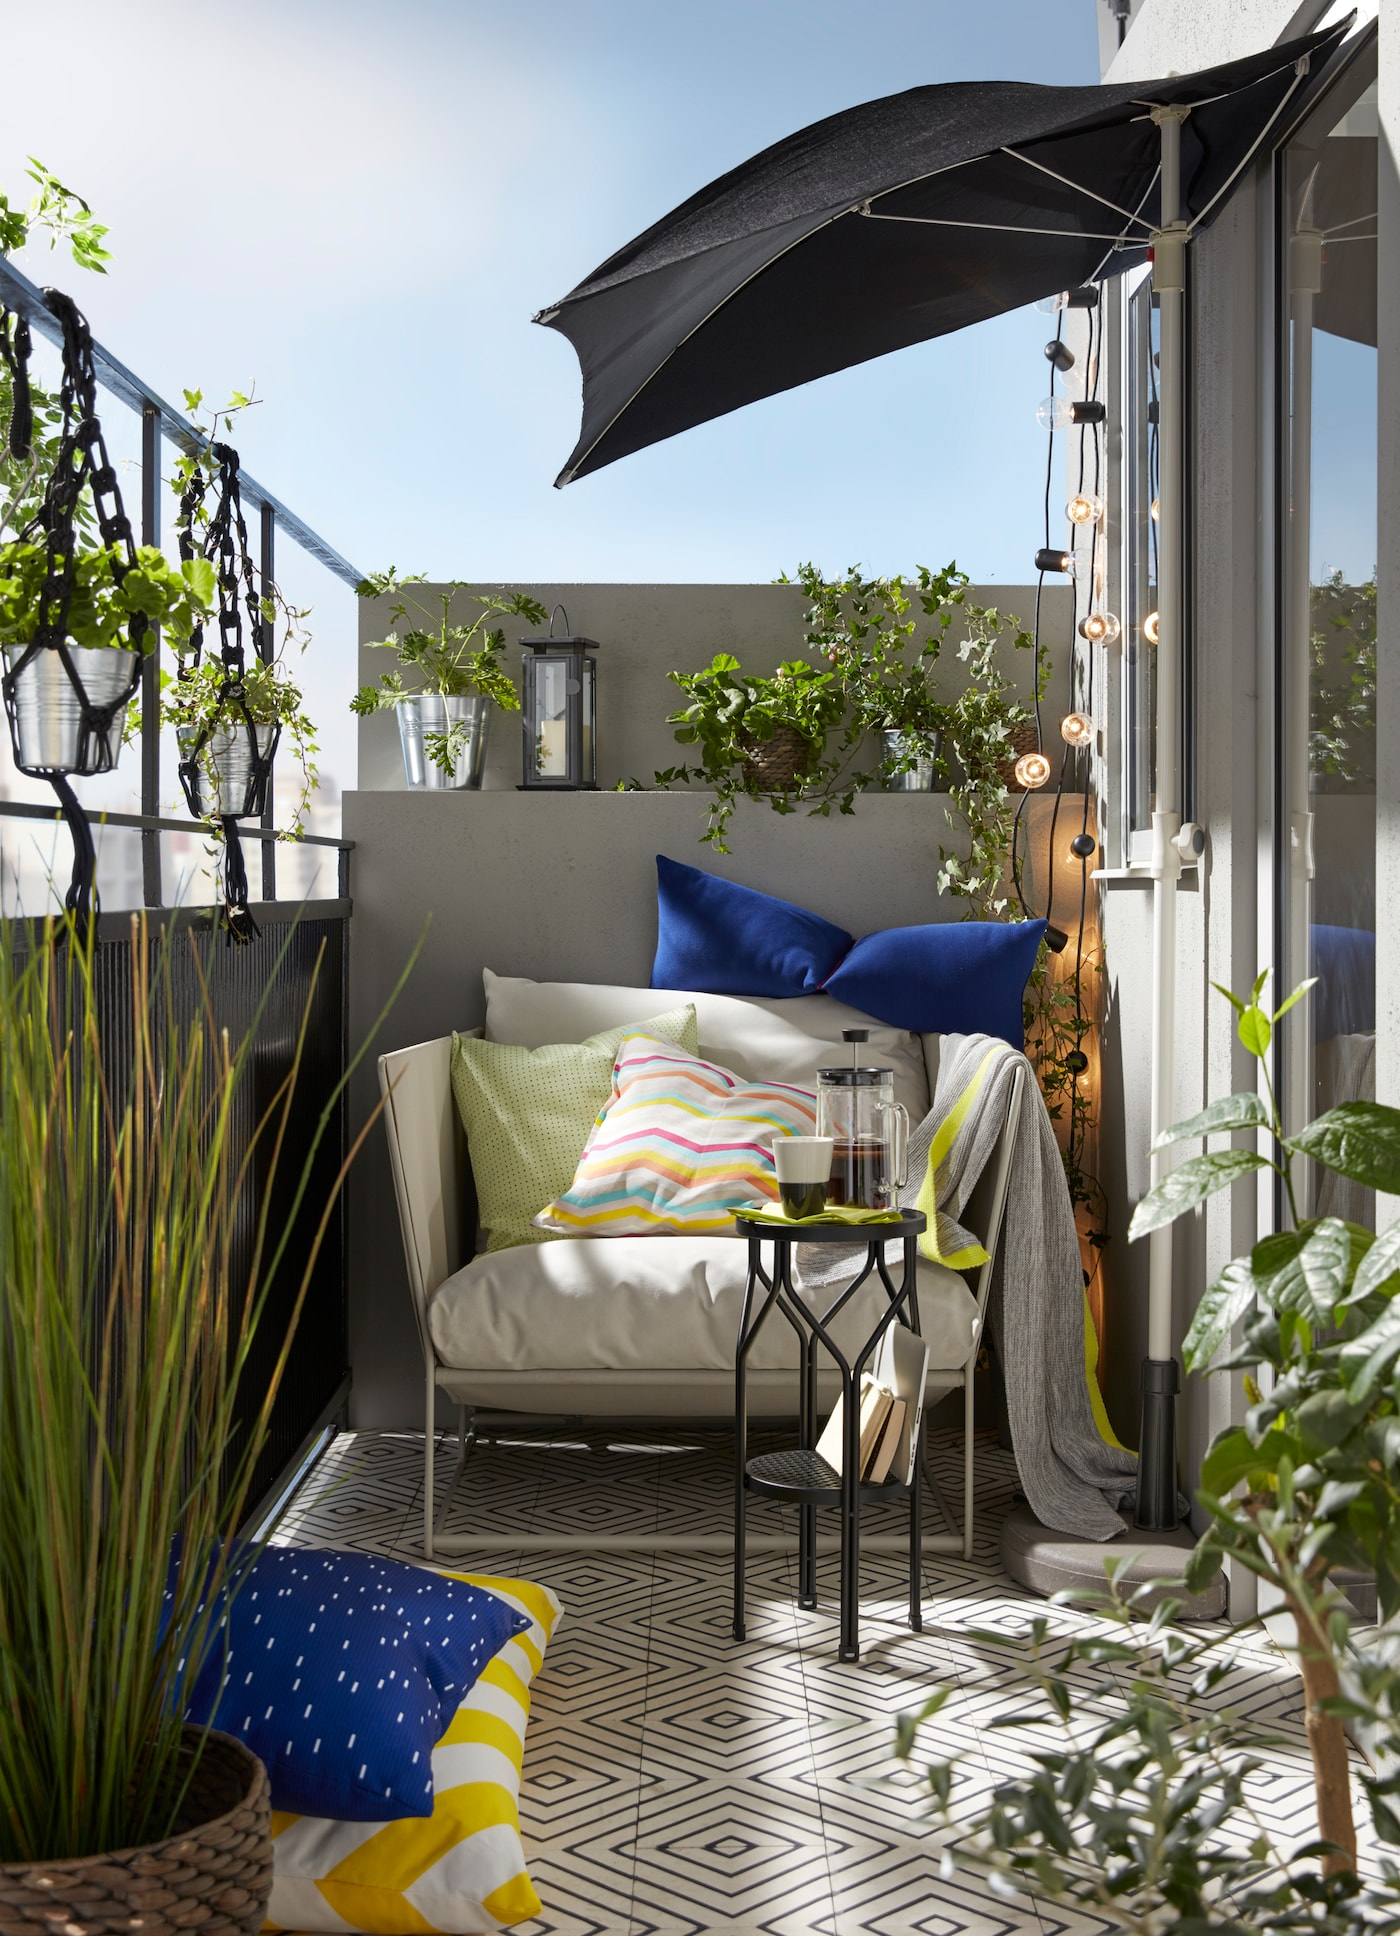 Arredare Il Balcone Ikea softer ways to enjoy the sunshine | ikea singapore - ikea